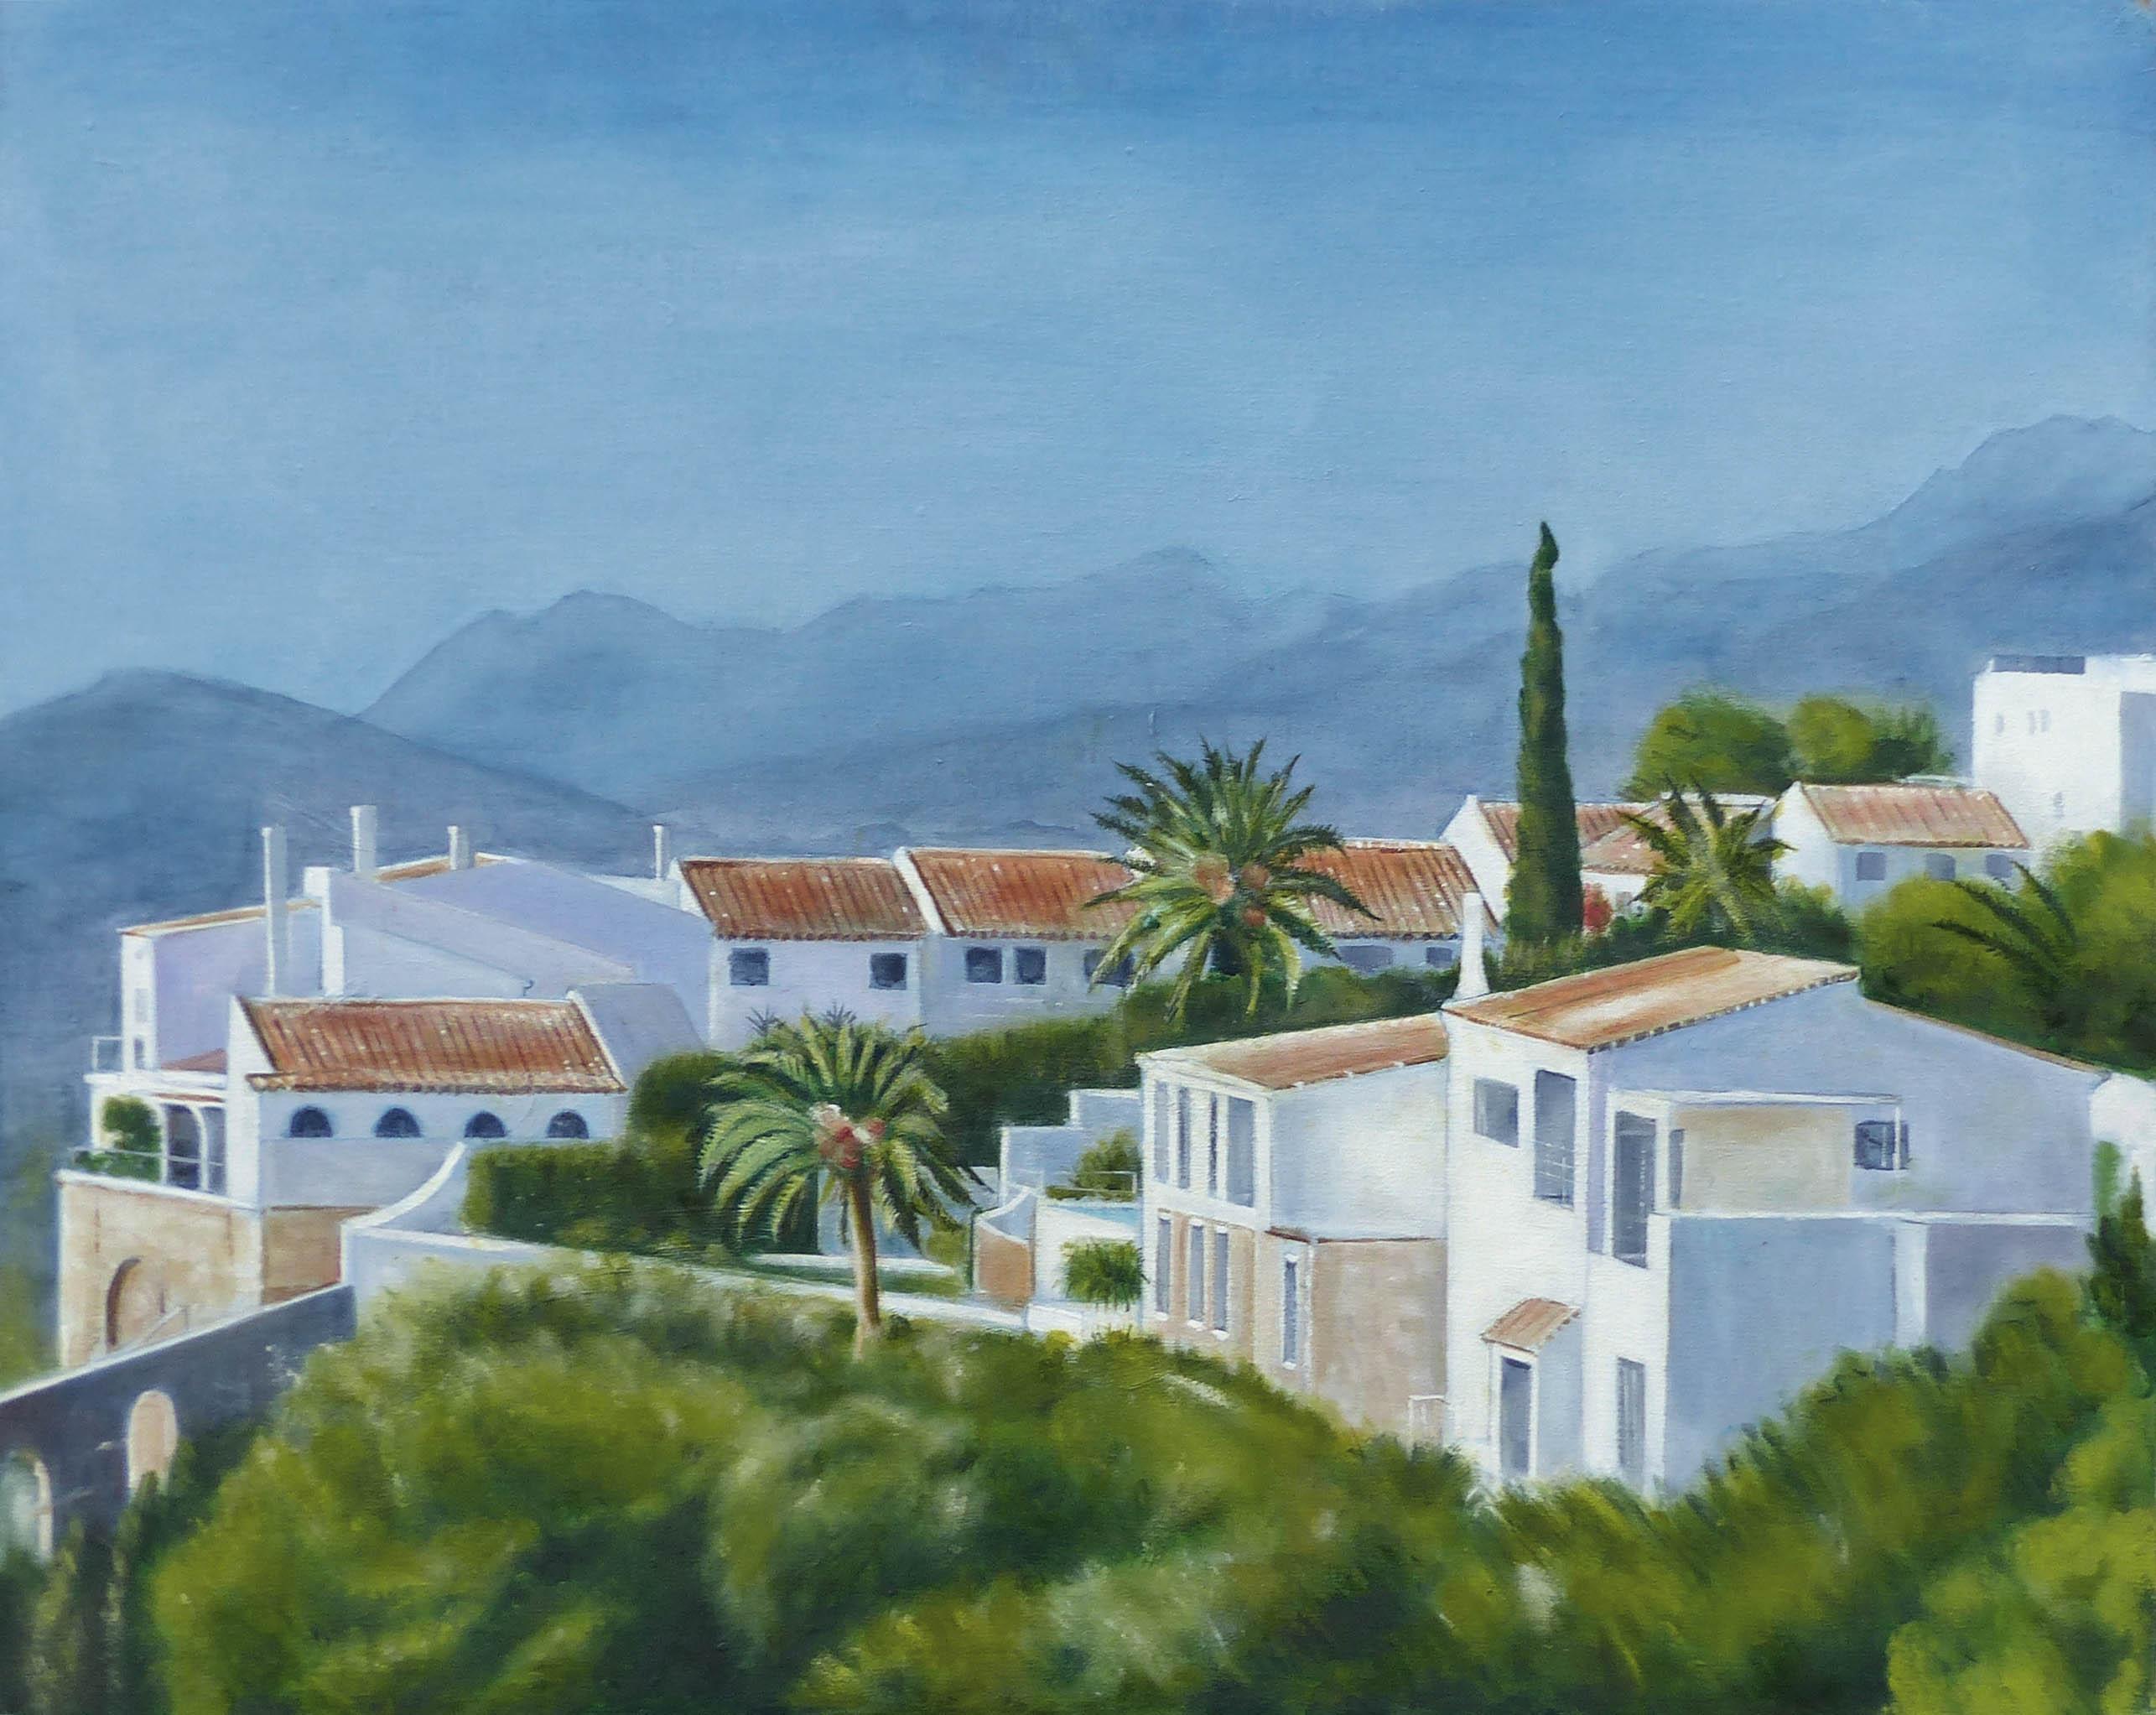 "Ref:  X0068. 'MIJAS PUEBLO'. Oils and Acrylic on Canvas. Size: 24"" x 30"". Price: £795.00"